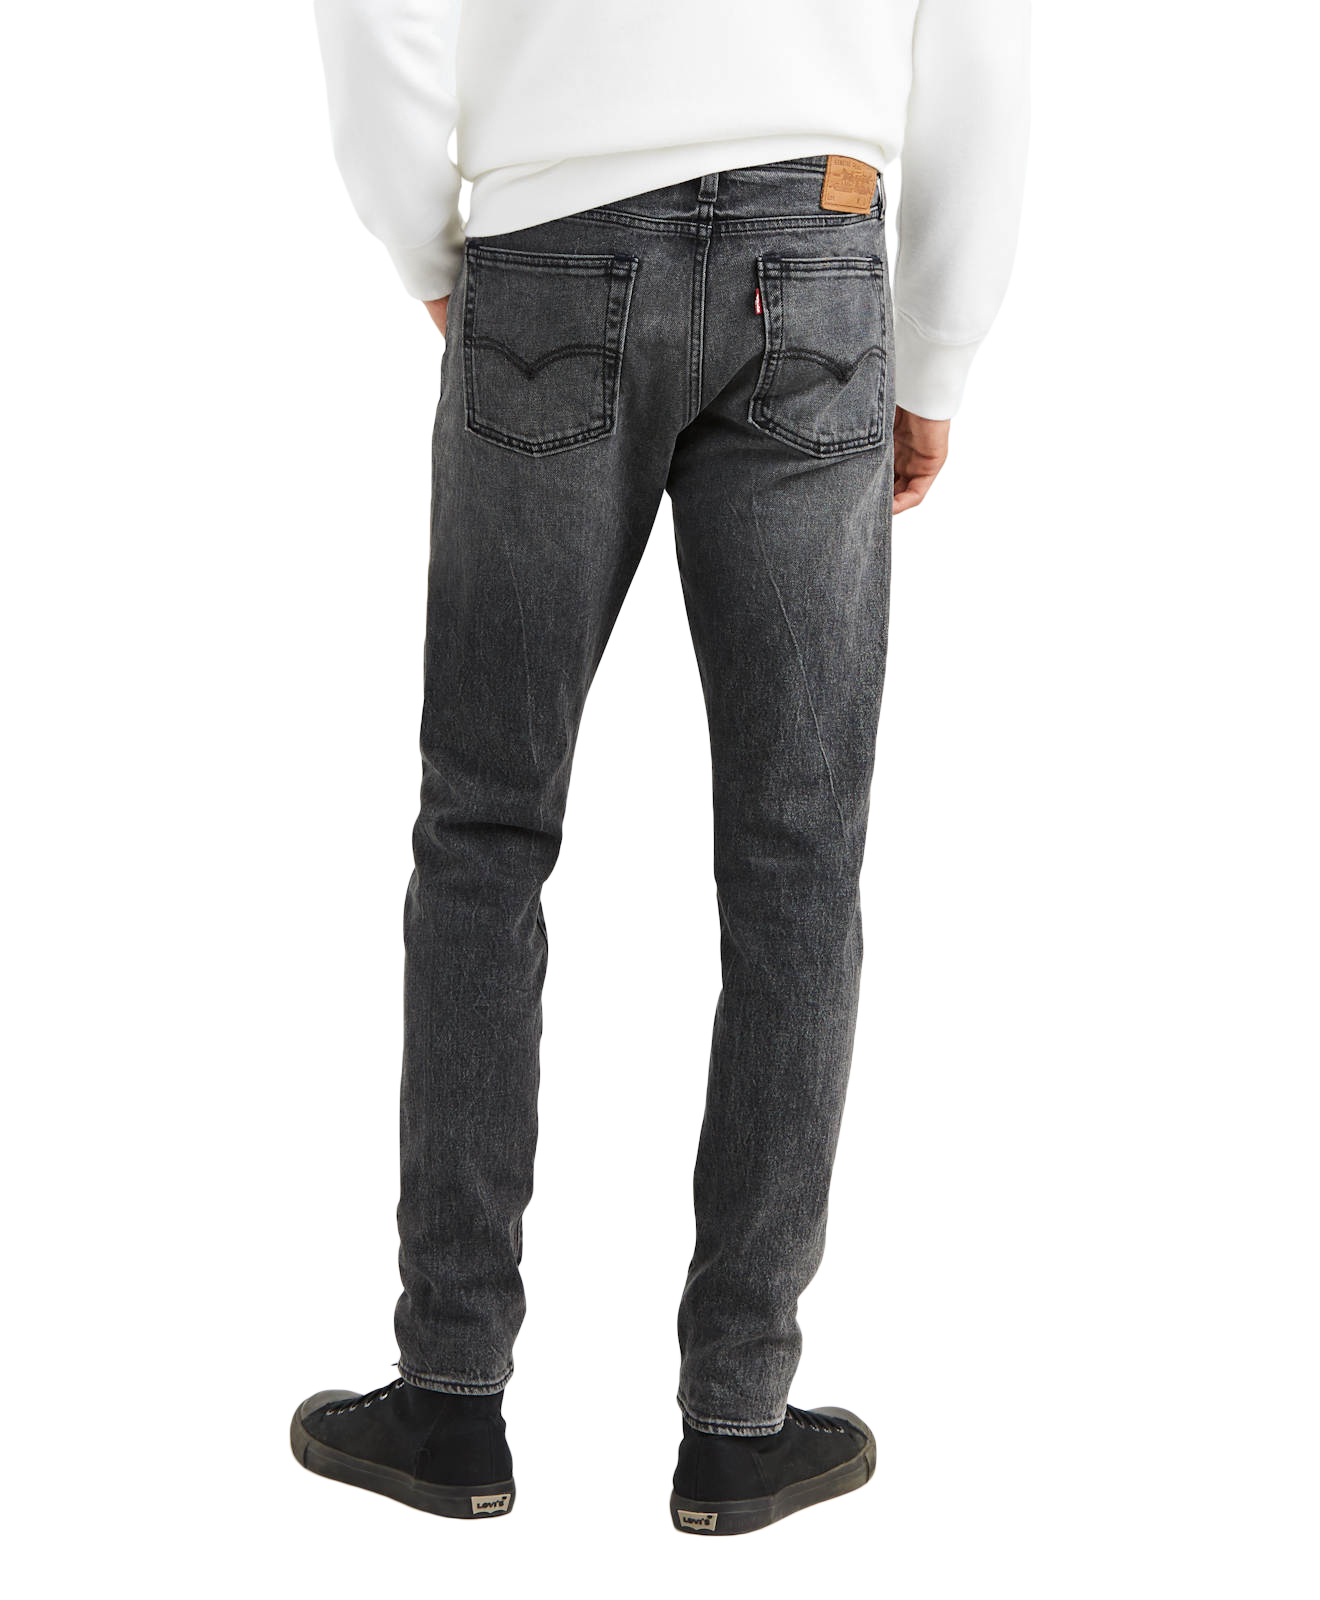 Levis-510-Jeans-Skinny-Fit-Herren-Hose-Luther-4-Way-05510-0807